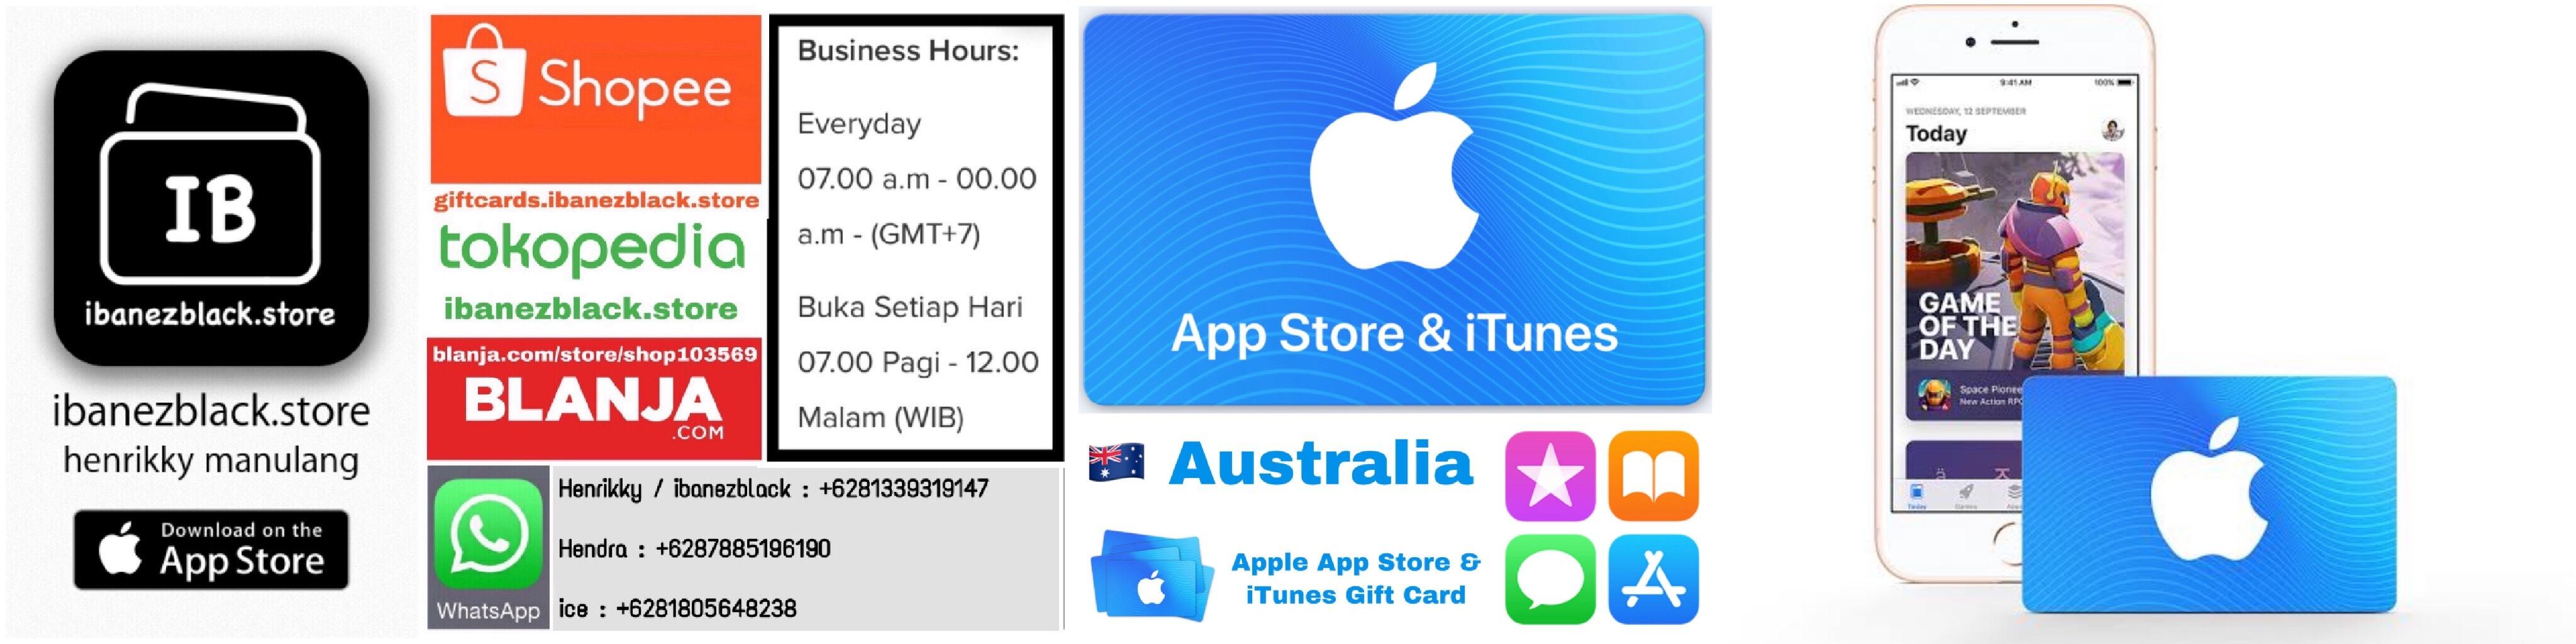 Apple App Store & iTunes Gift Card Australia